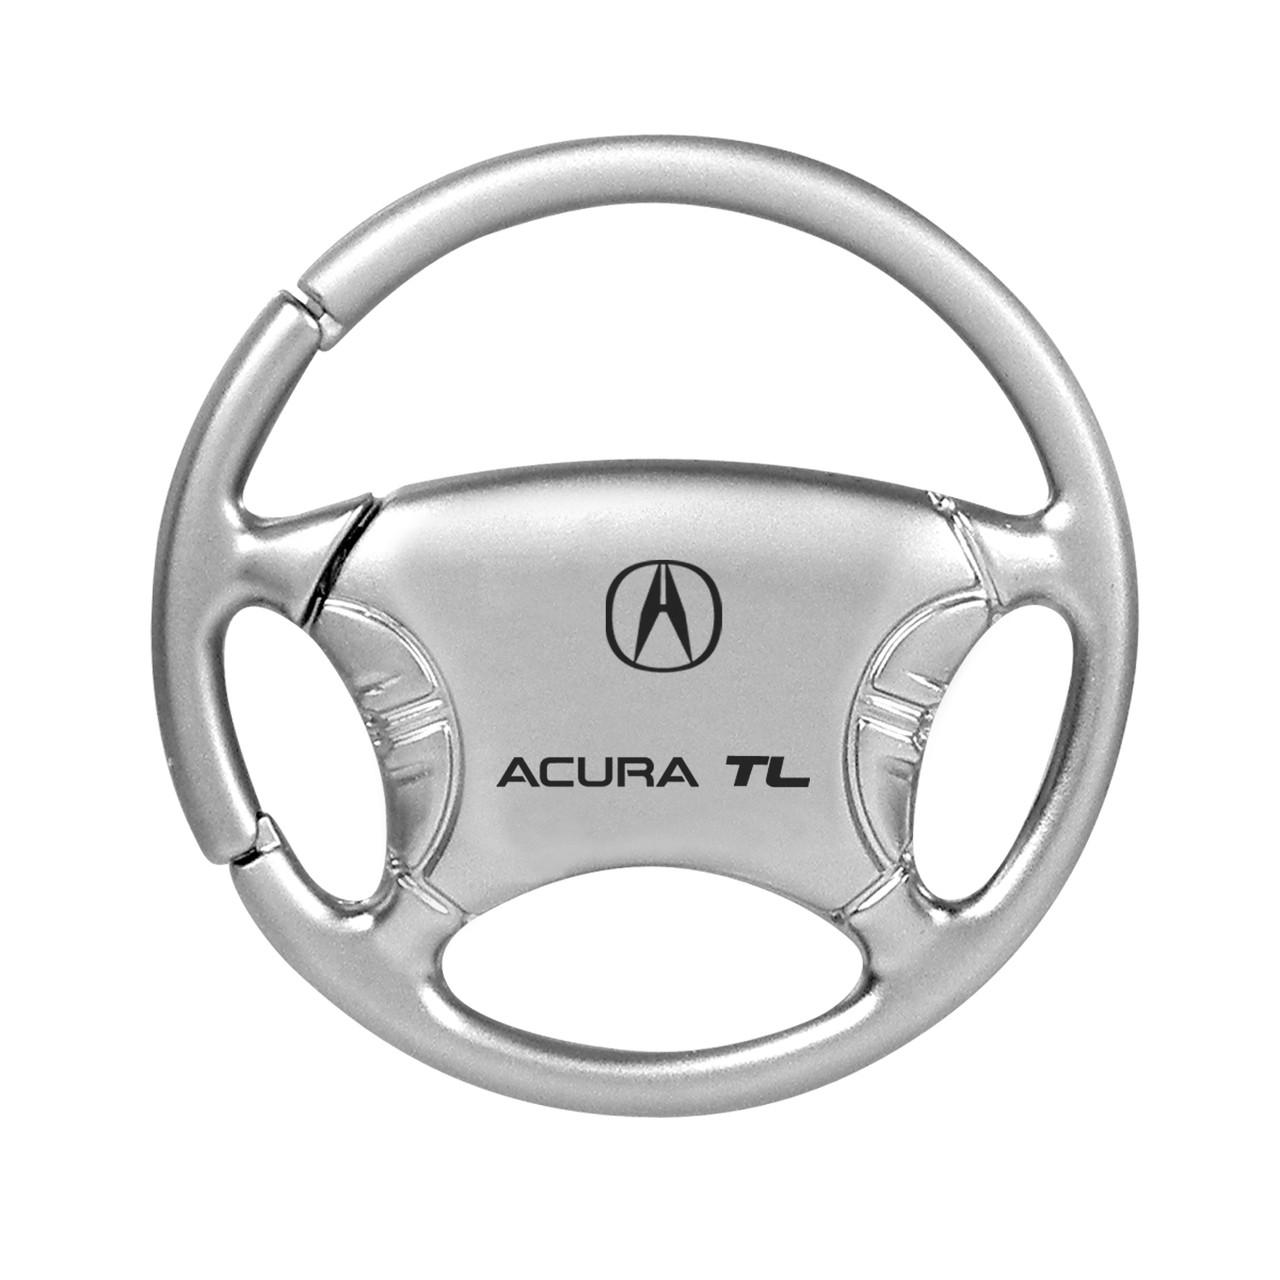 Valet Keychain /& Keyring with Acura RDX Logo